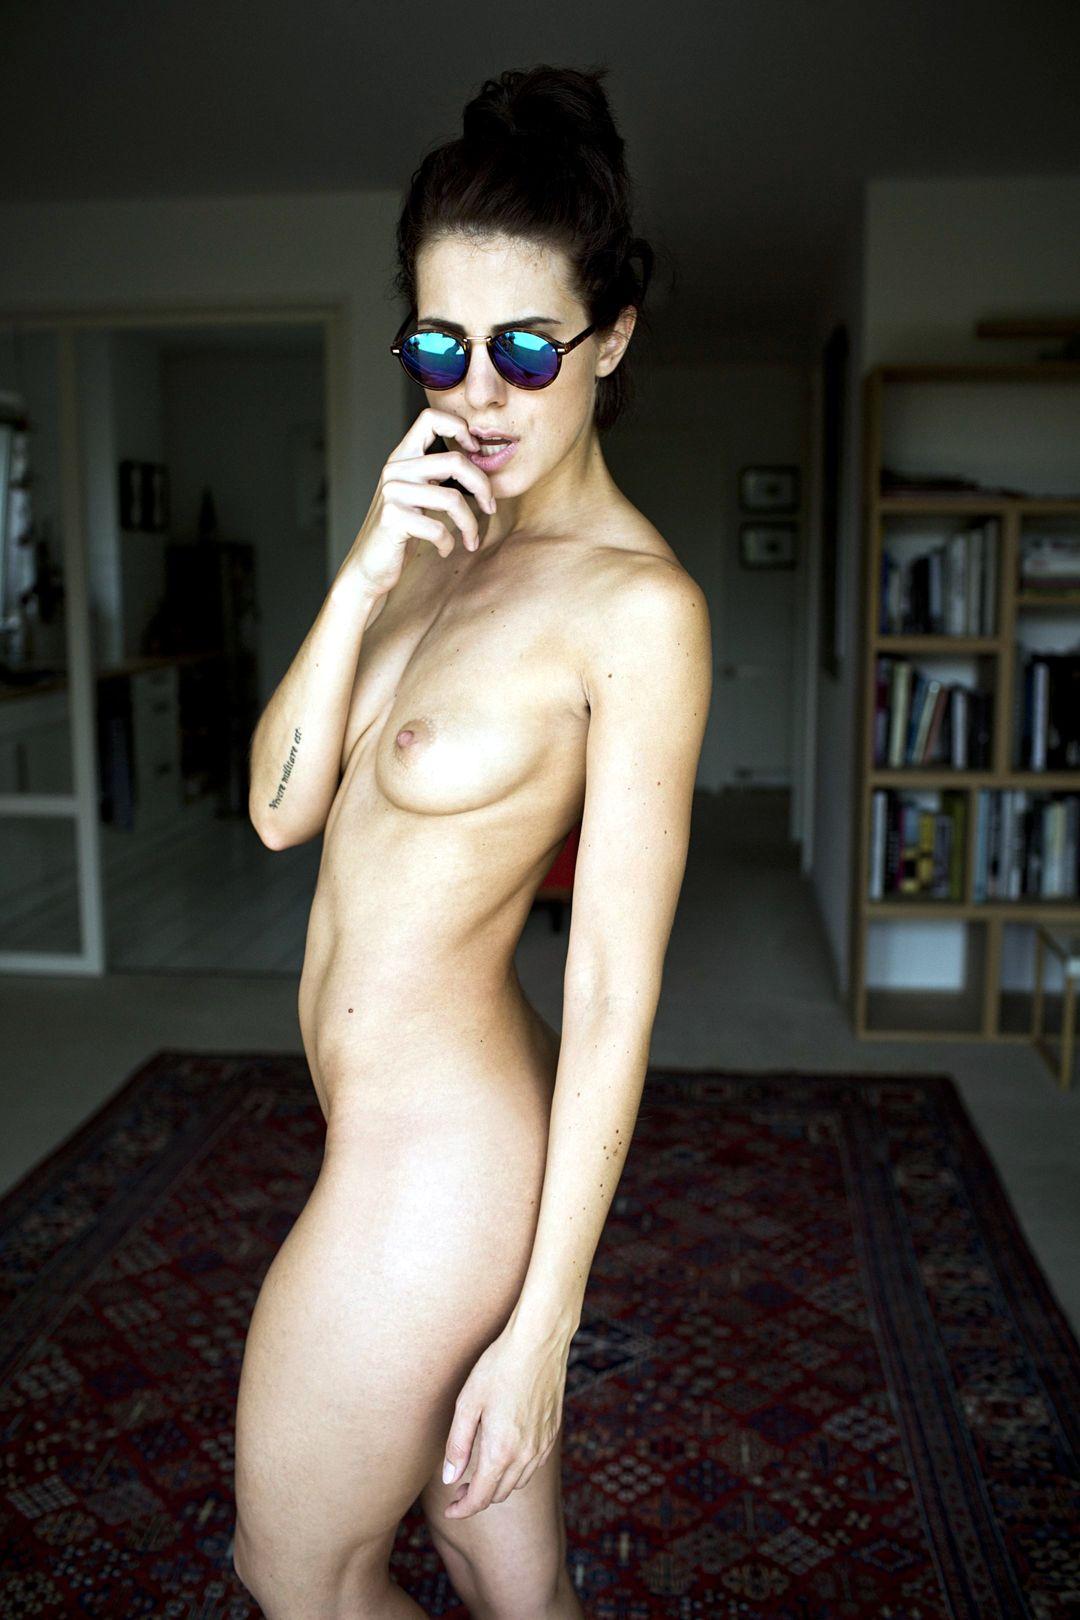 Franzi Skamet Nude Photos and Videos nude (57 photos), Sideboobs Celebrites image